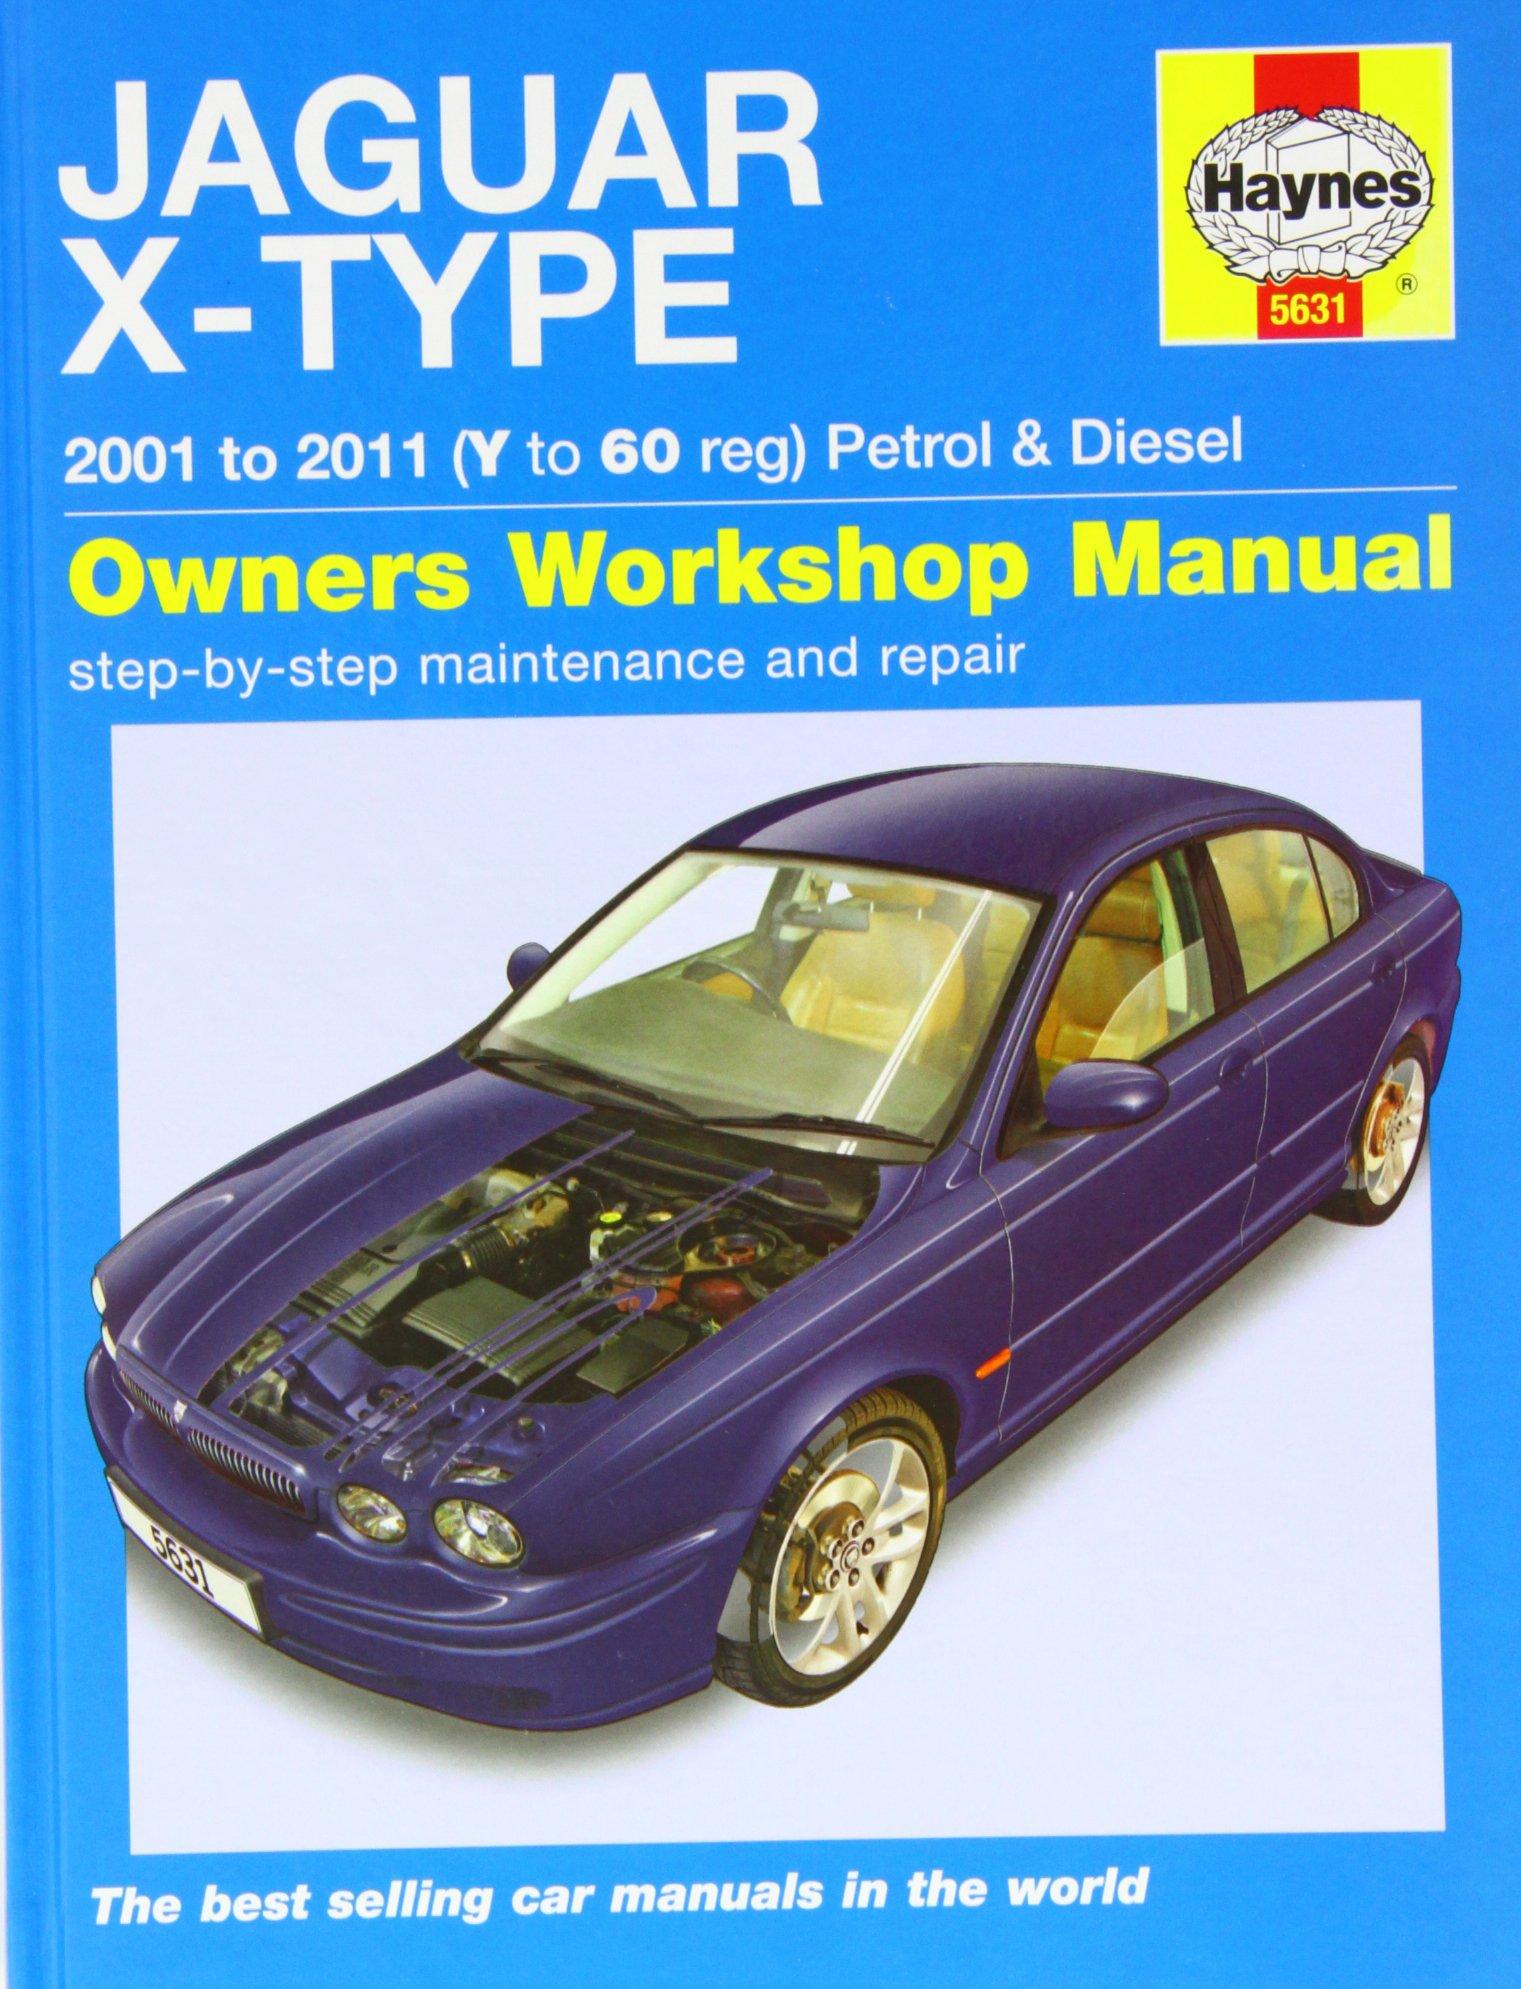 2005 jaguar x type owners manual daily instruction manual guides u2022 rh testingwordpress co 2003 jaguar x type owners manual pdf 2003 jaguar x type service manual